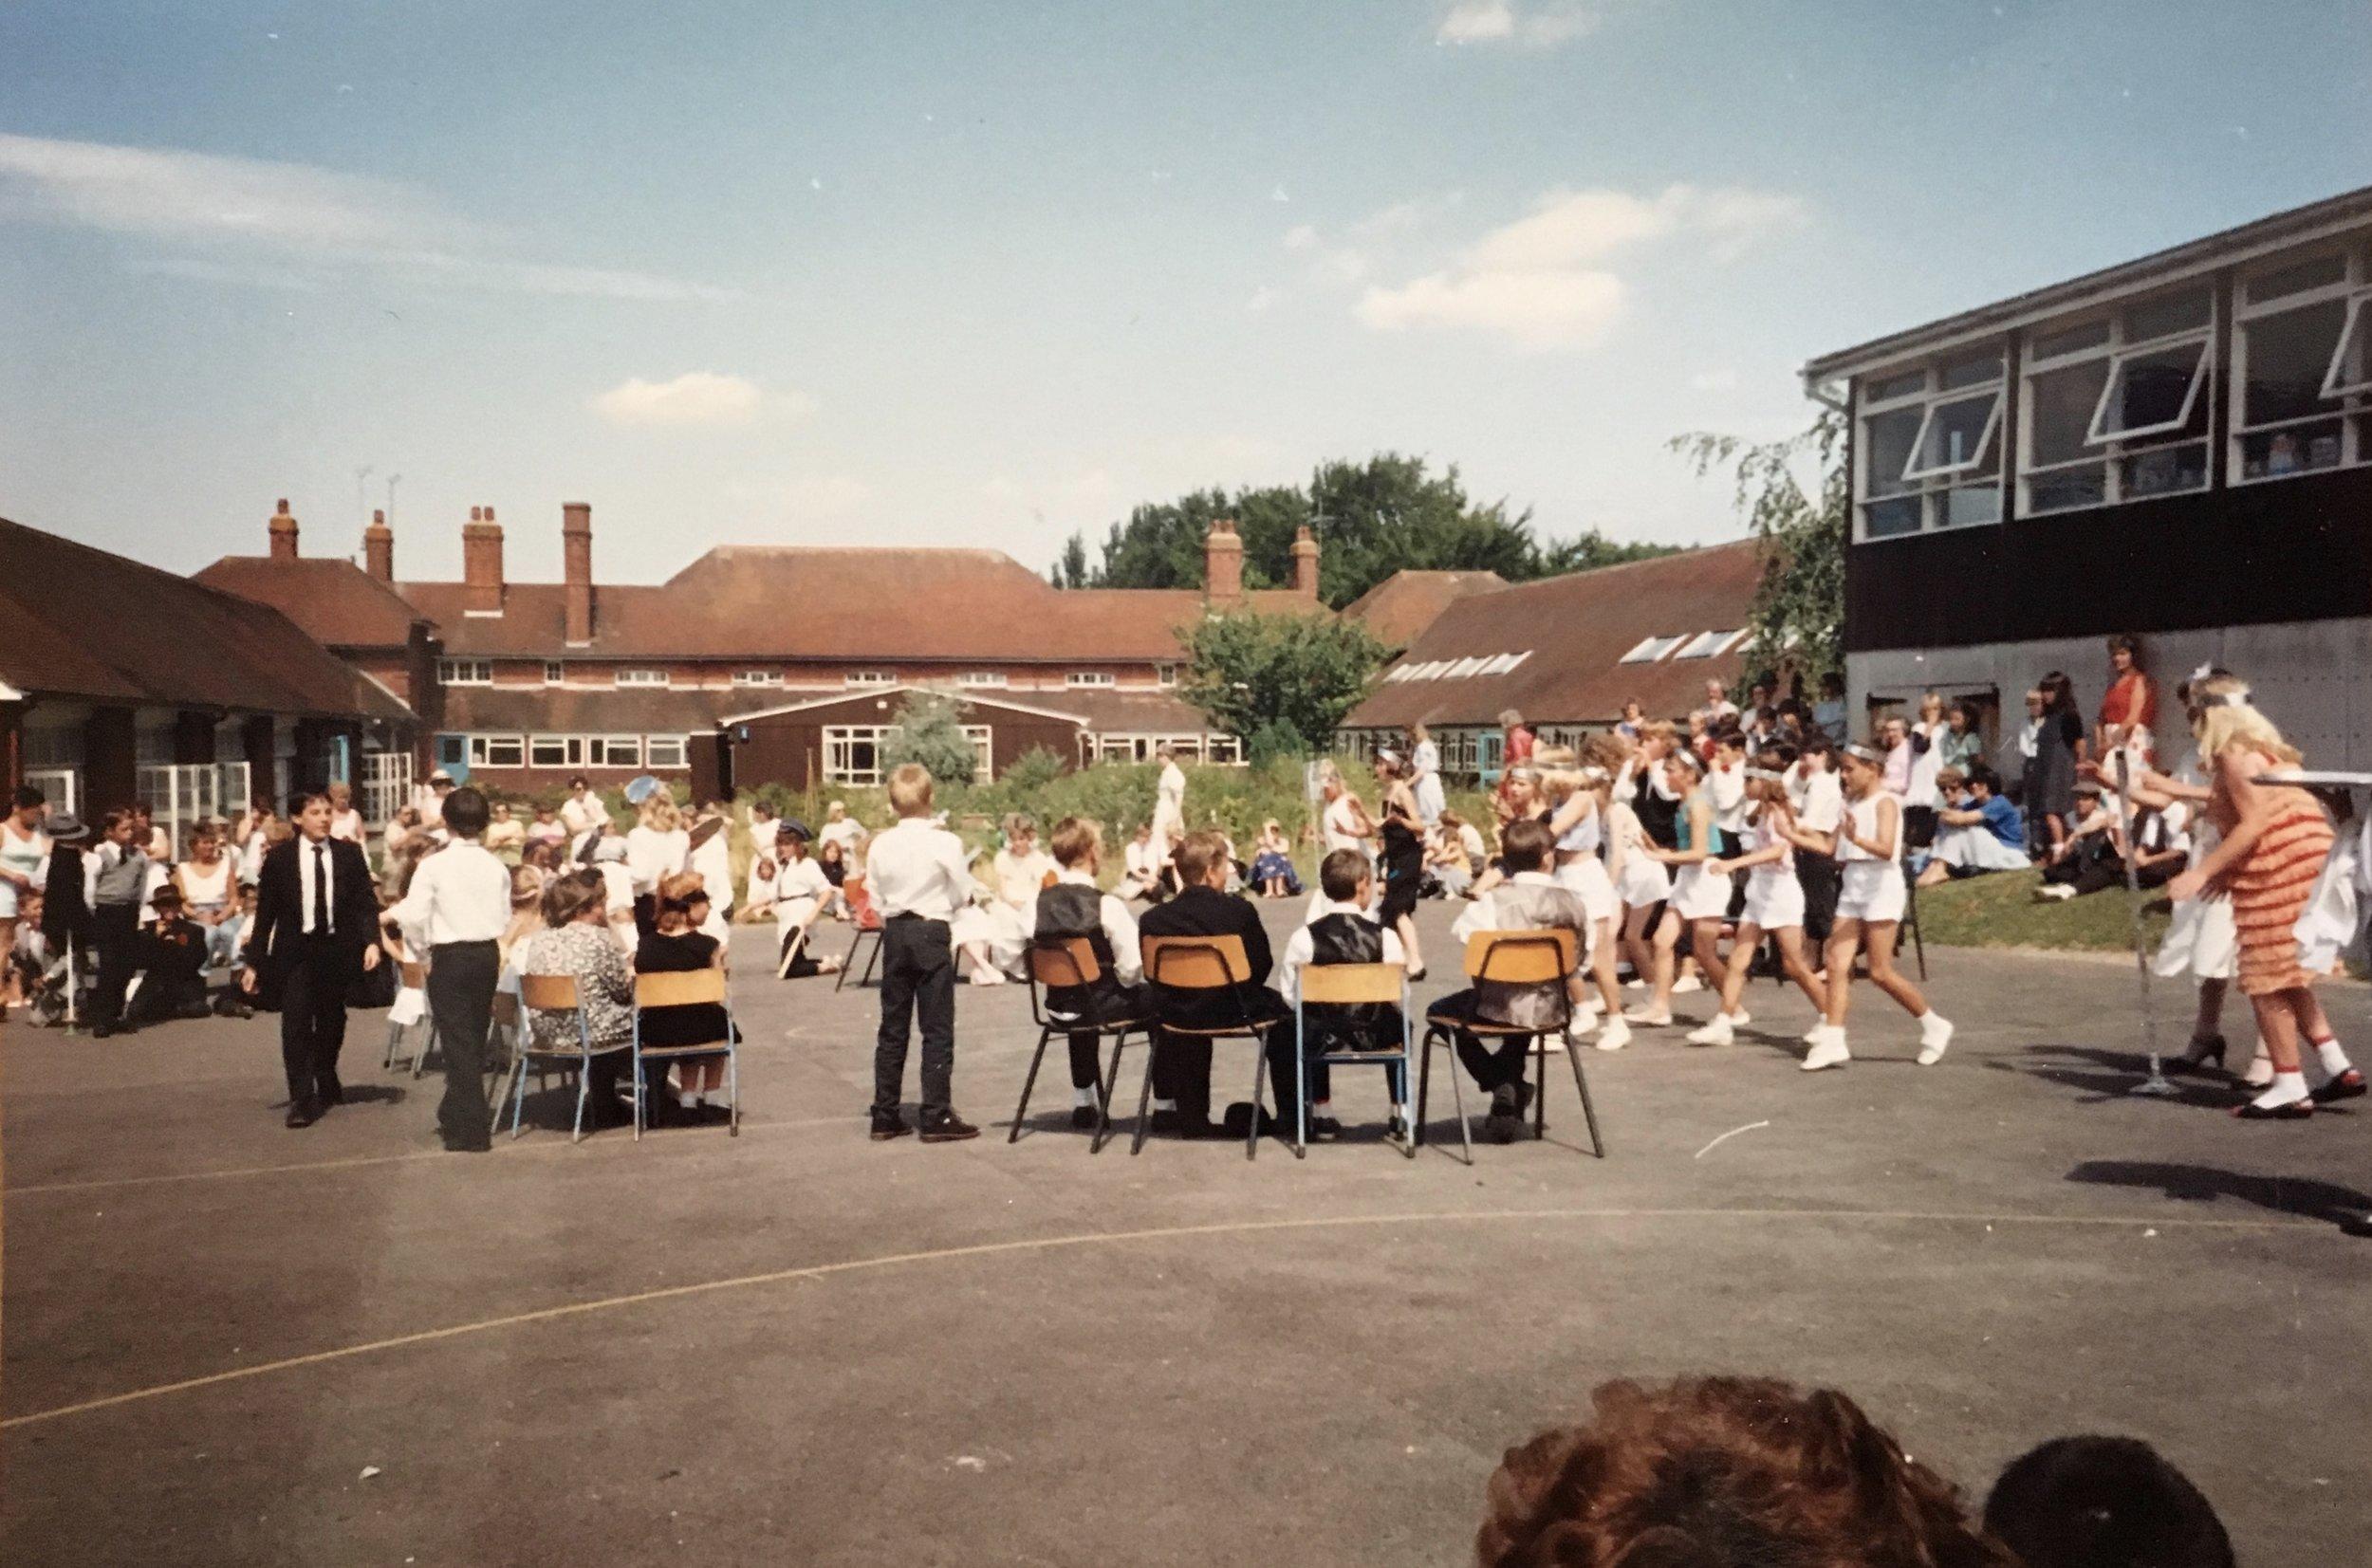 Stanmore Jubilee Day, 14 July 1989 Year 6 1920's Speakeasy Sketch